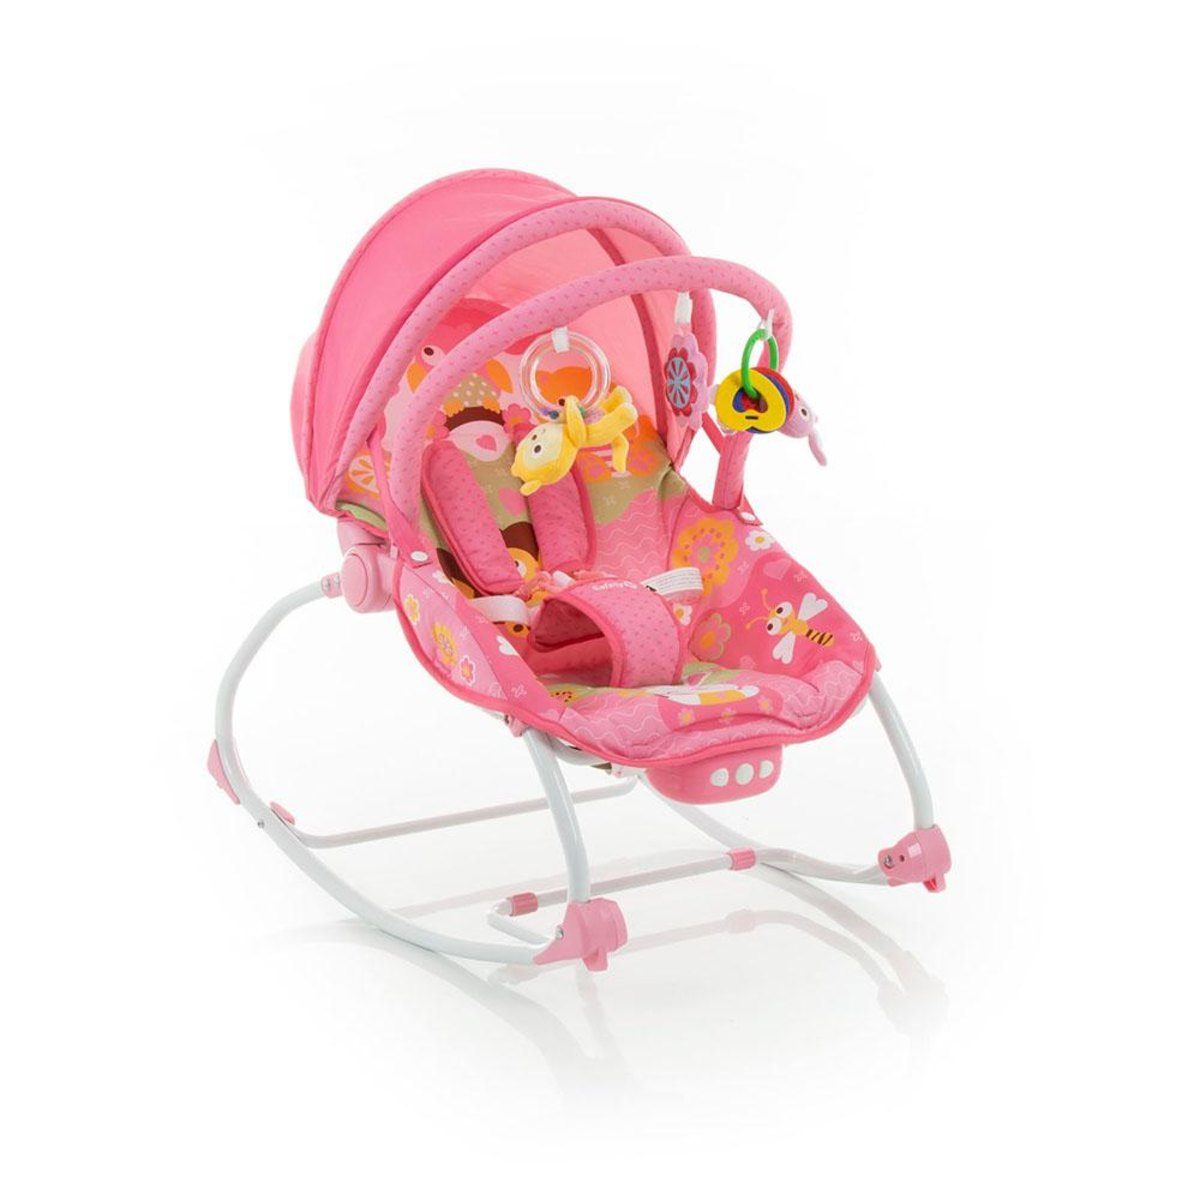 Cadeira de Descanso Sunshine Baby Vibratória Pink 1st - Safety